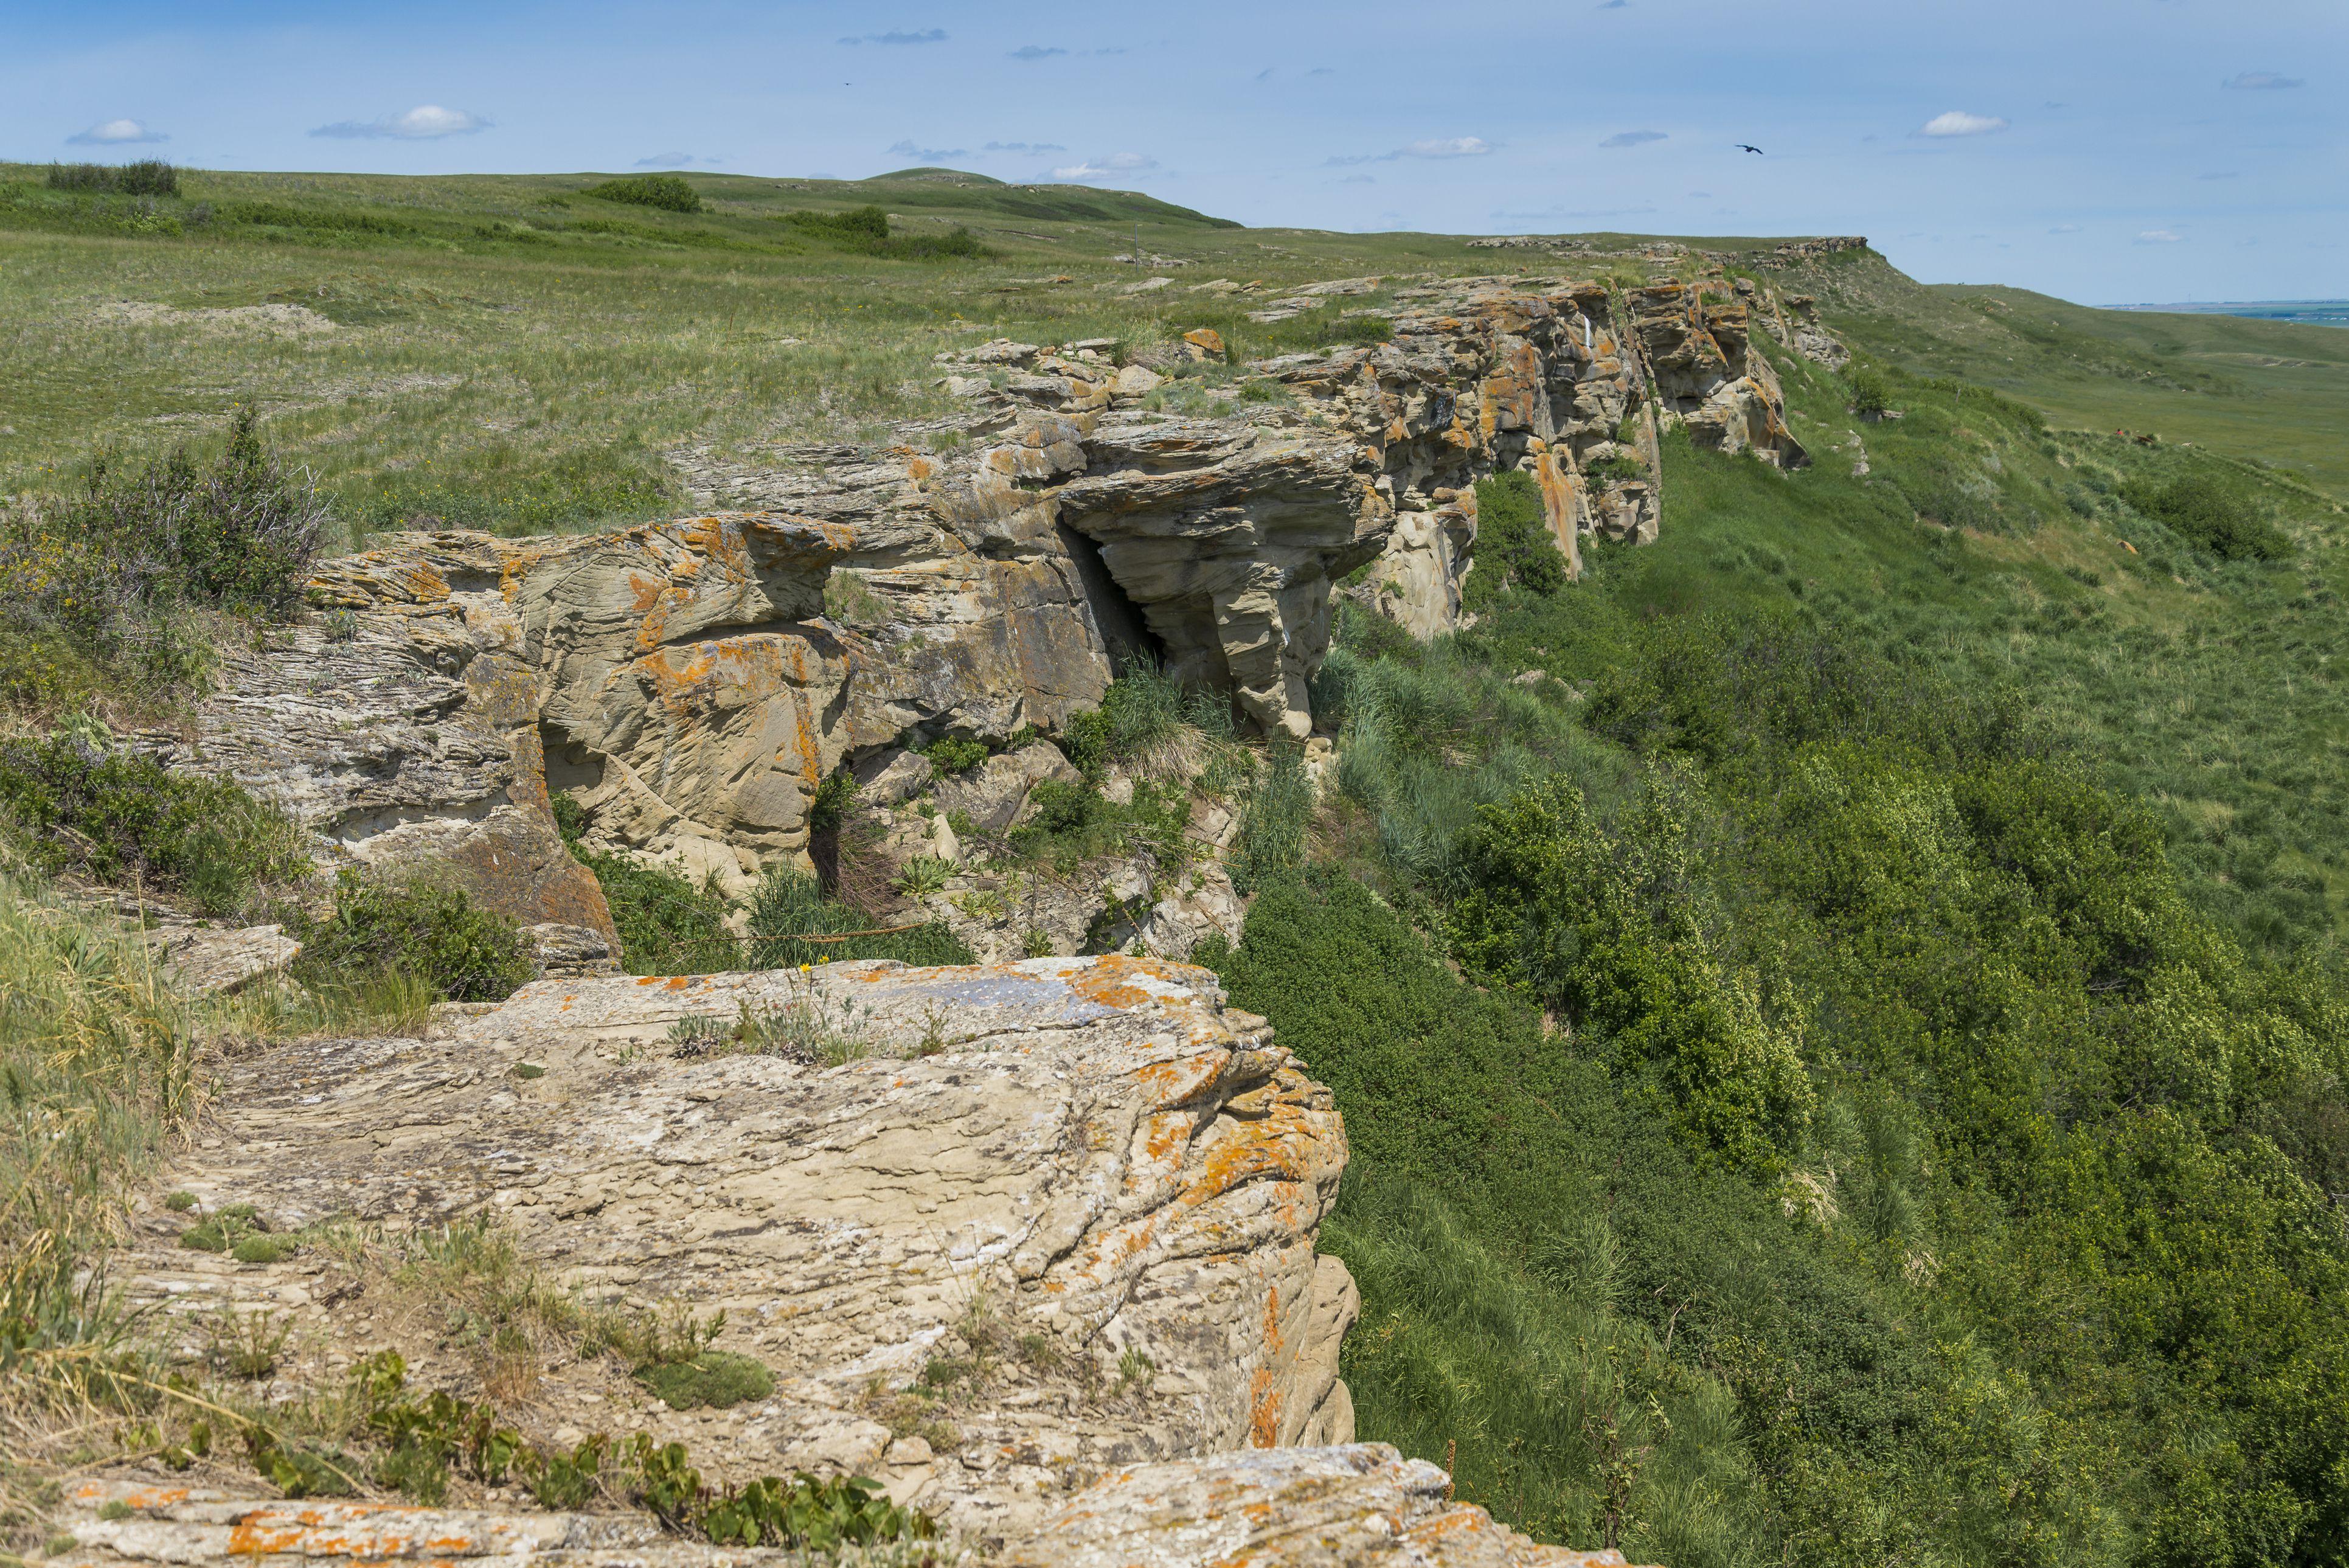 The cliff ridge at Head Smashed in Buffalo Jump near Fort Macleod, Alberta, Canada